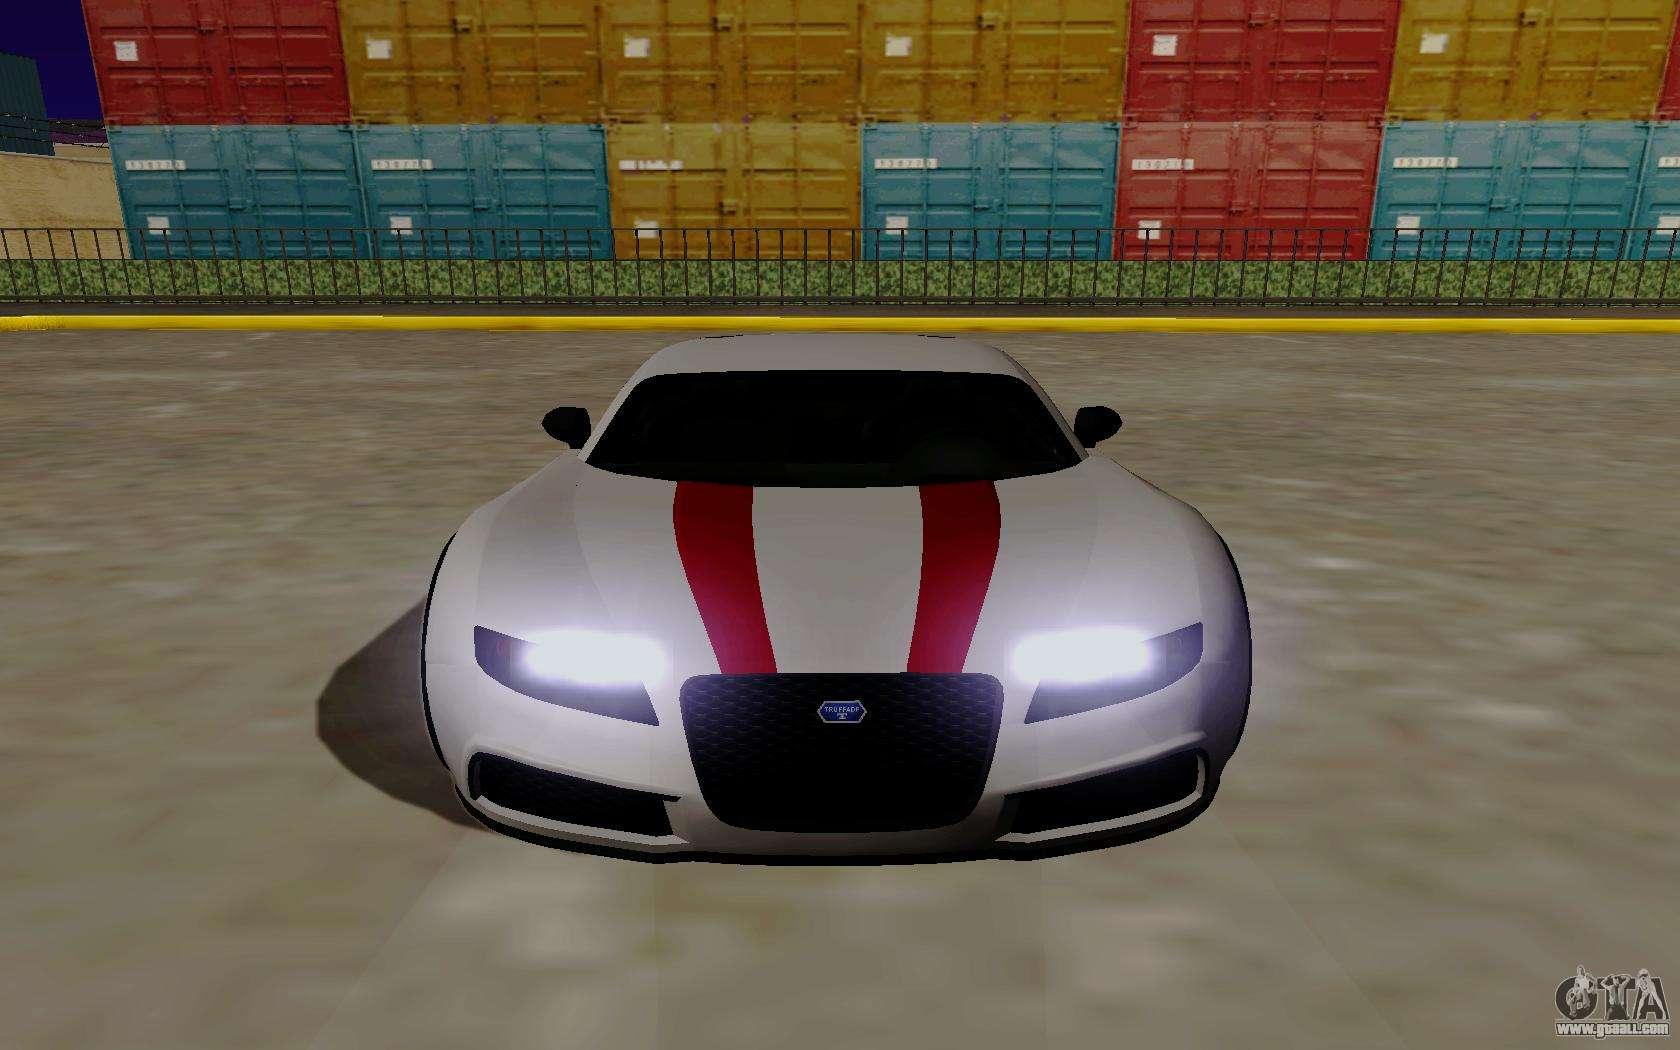 Watch likewise Watch further Watch in addition Gta 5 Os Nove Carros Mais Rapidos E besides Gta 5 Bugatti Veyron Hier Finden Sie Ihn 28142. on gta 5 adder location